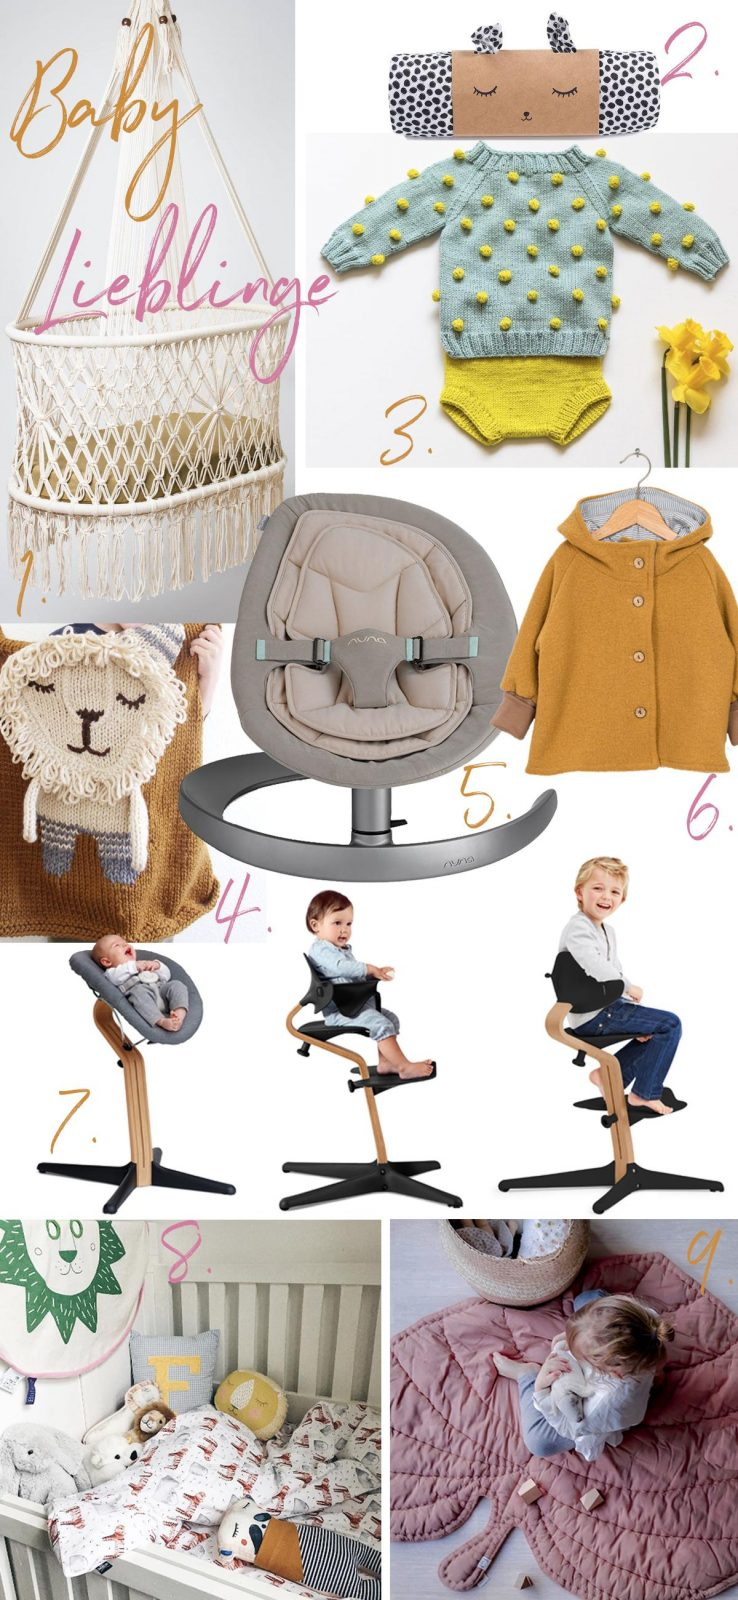 Pinterest Baby Lieblingsprodukte | Pinspiration